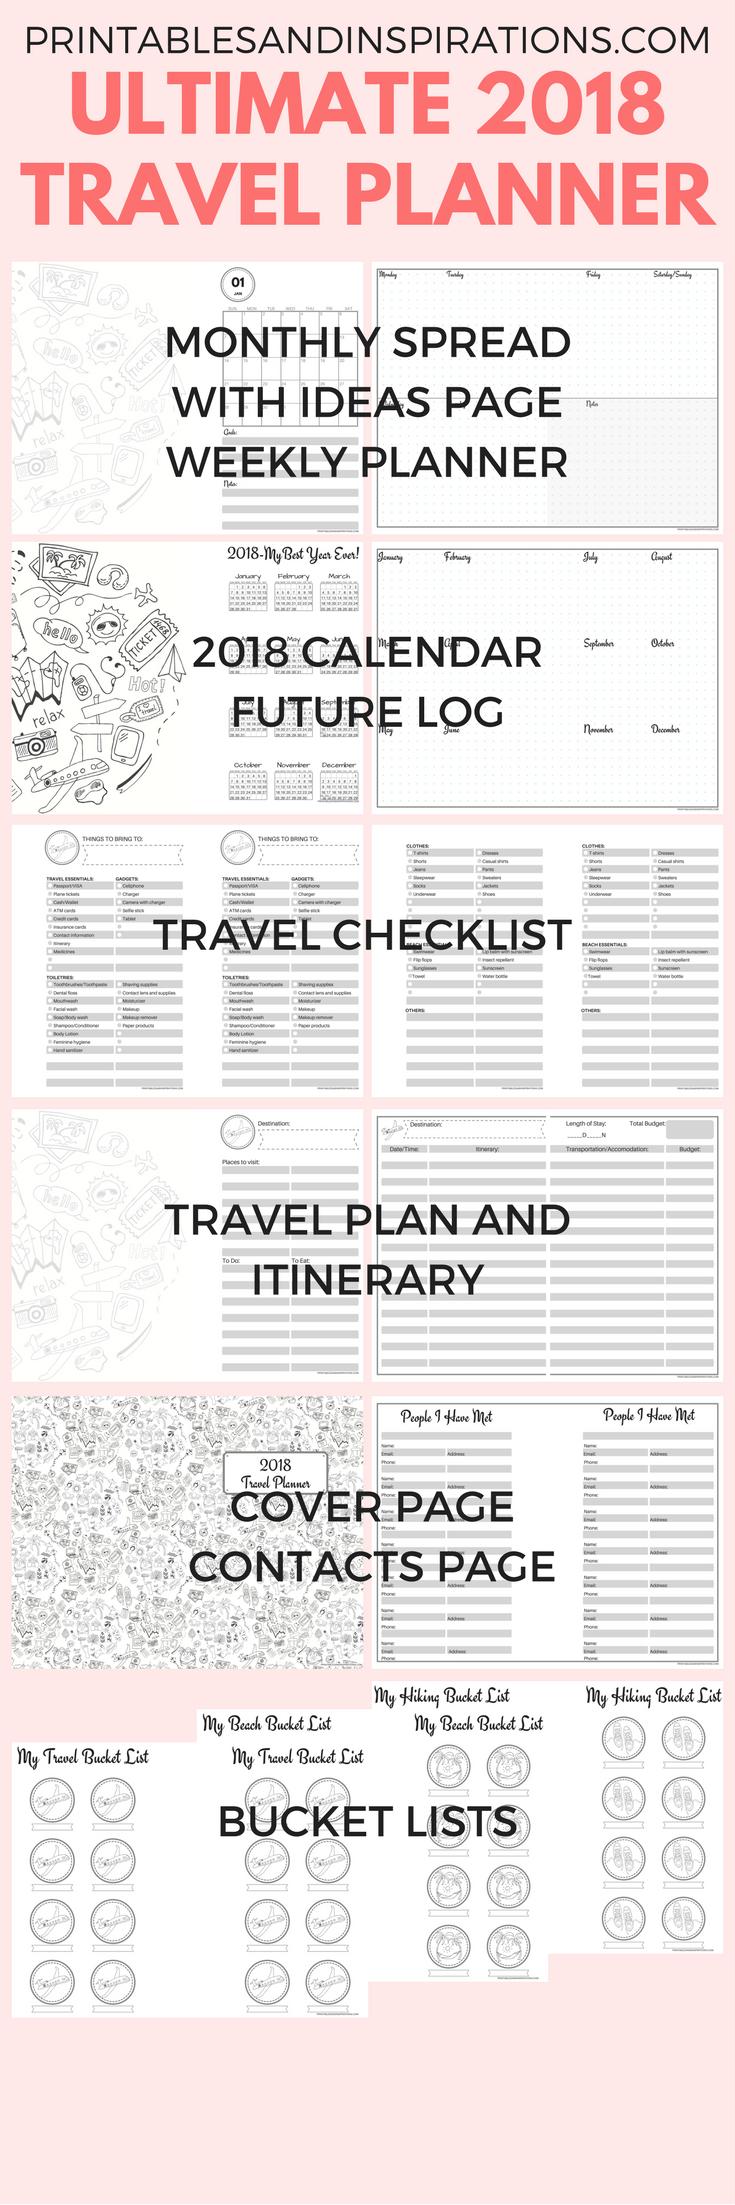 free printable 2018 calendar half size planner 2018 monthly planner printables weekly planner travel planner travel printables travel checklist